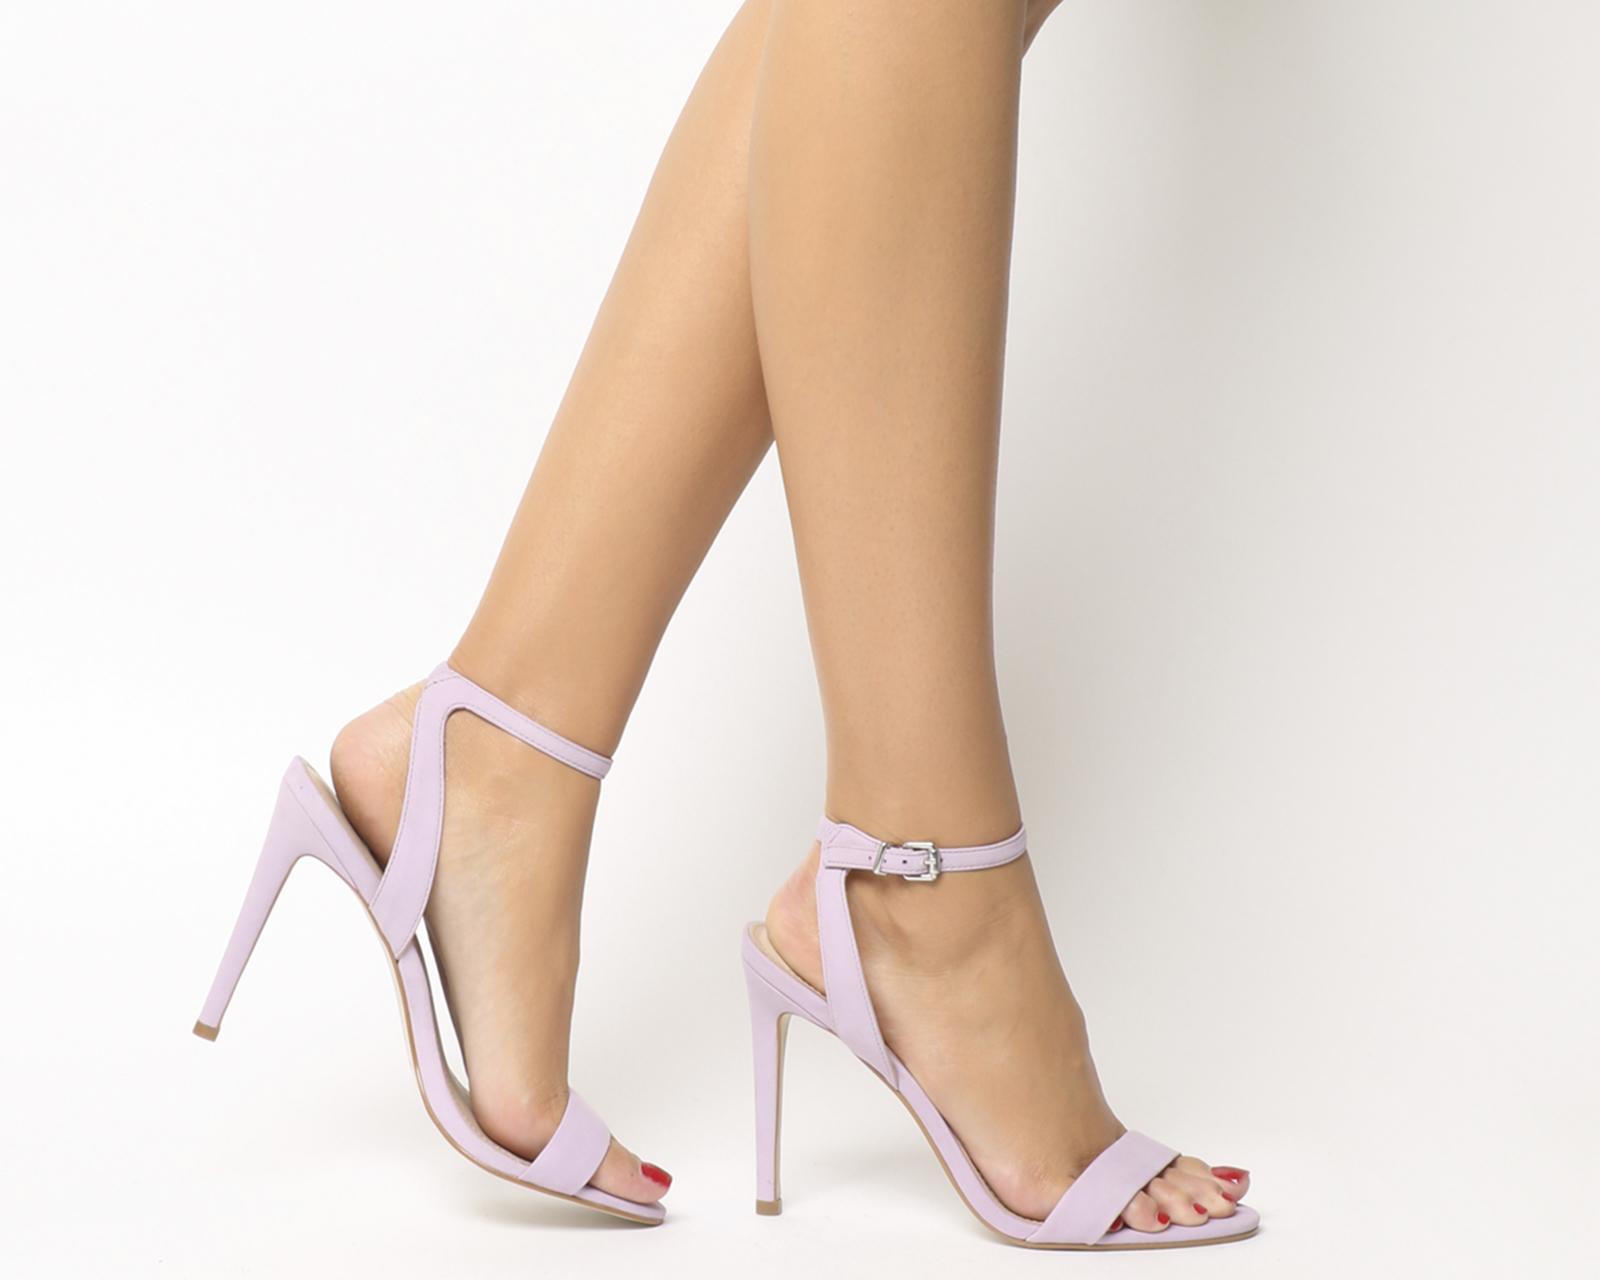 52fcc78fca8a Sentinel womens office alana single sole sandals lilac nubuck heels jpg  1600x1280 Lilac strappy heels